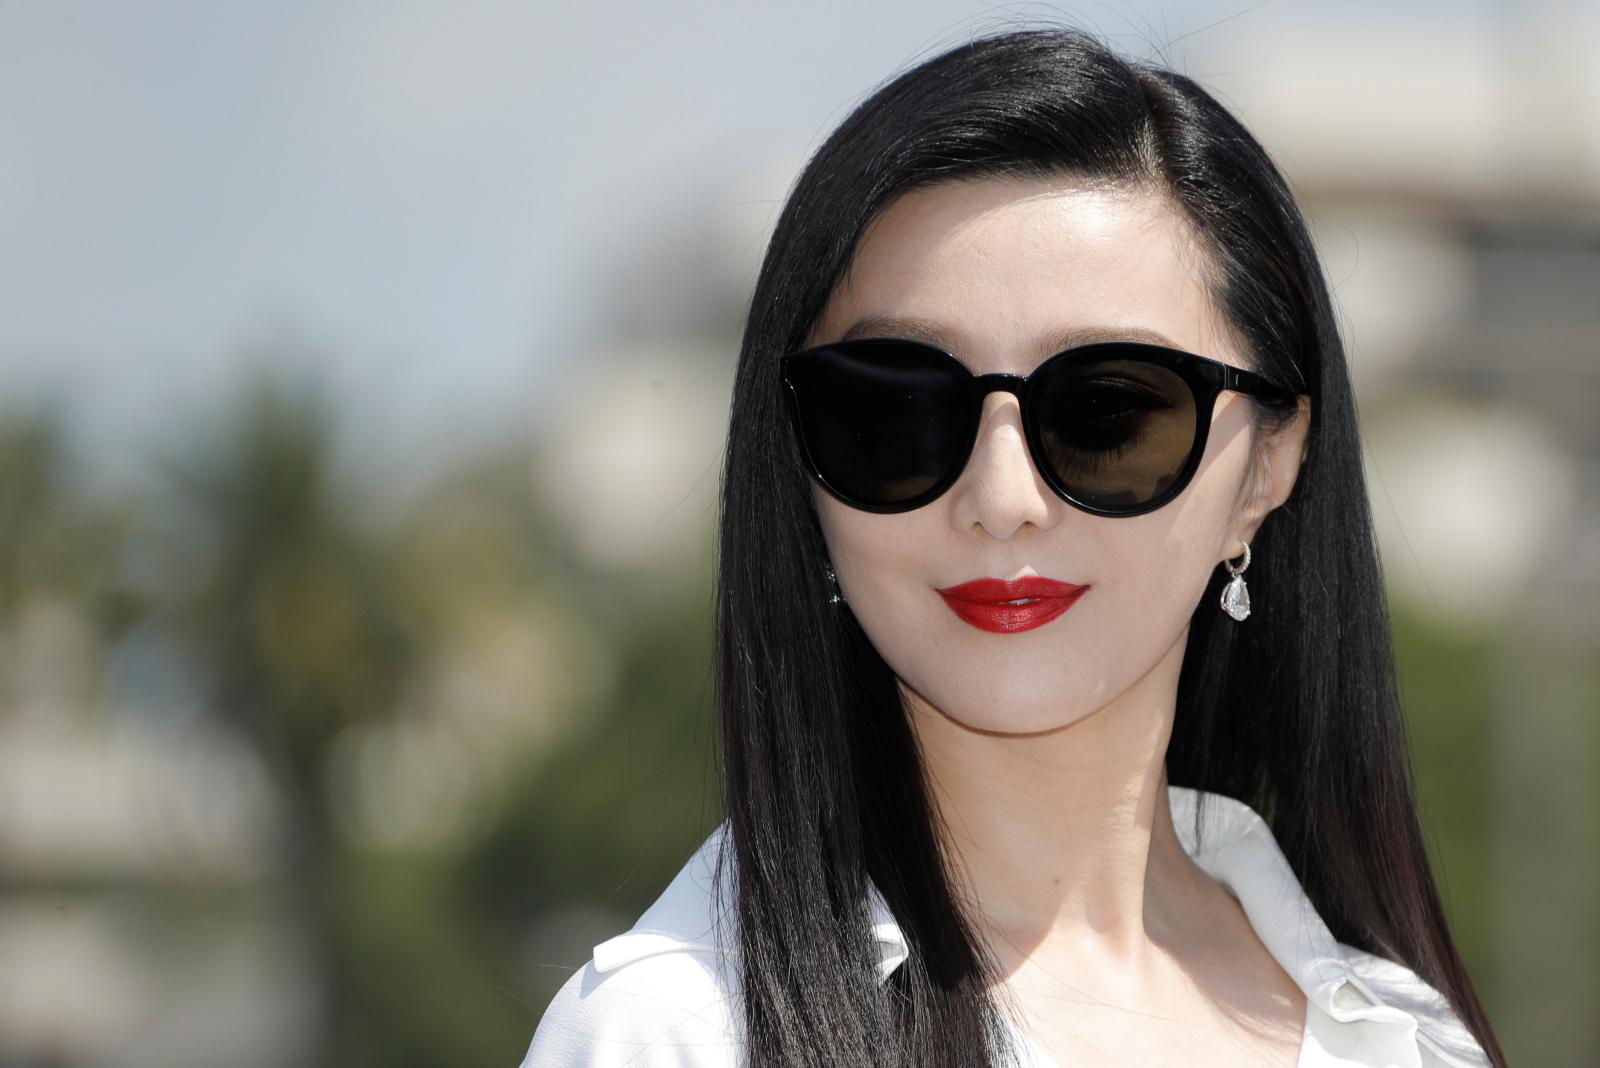 China orders missing X-Men actress Fan Bingbing to pay $130m tax fine